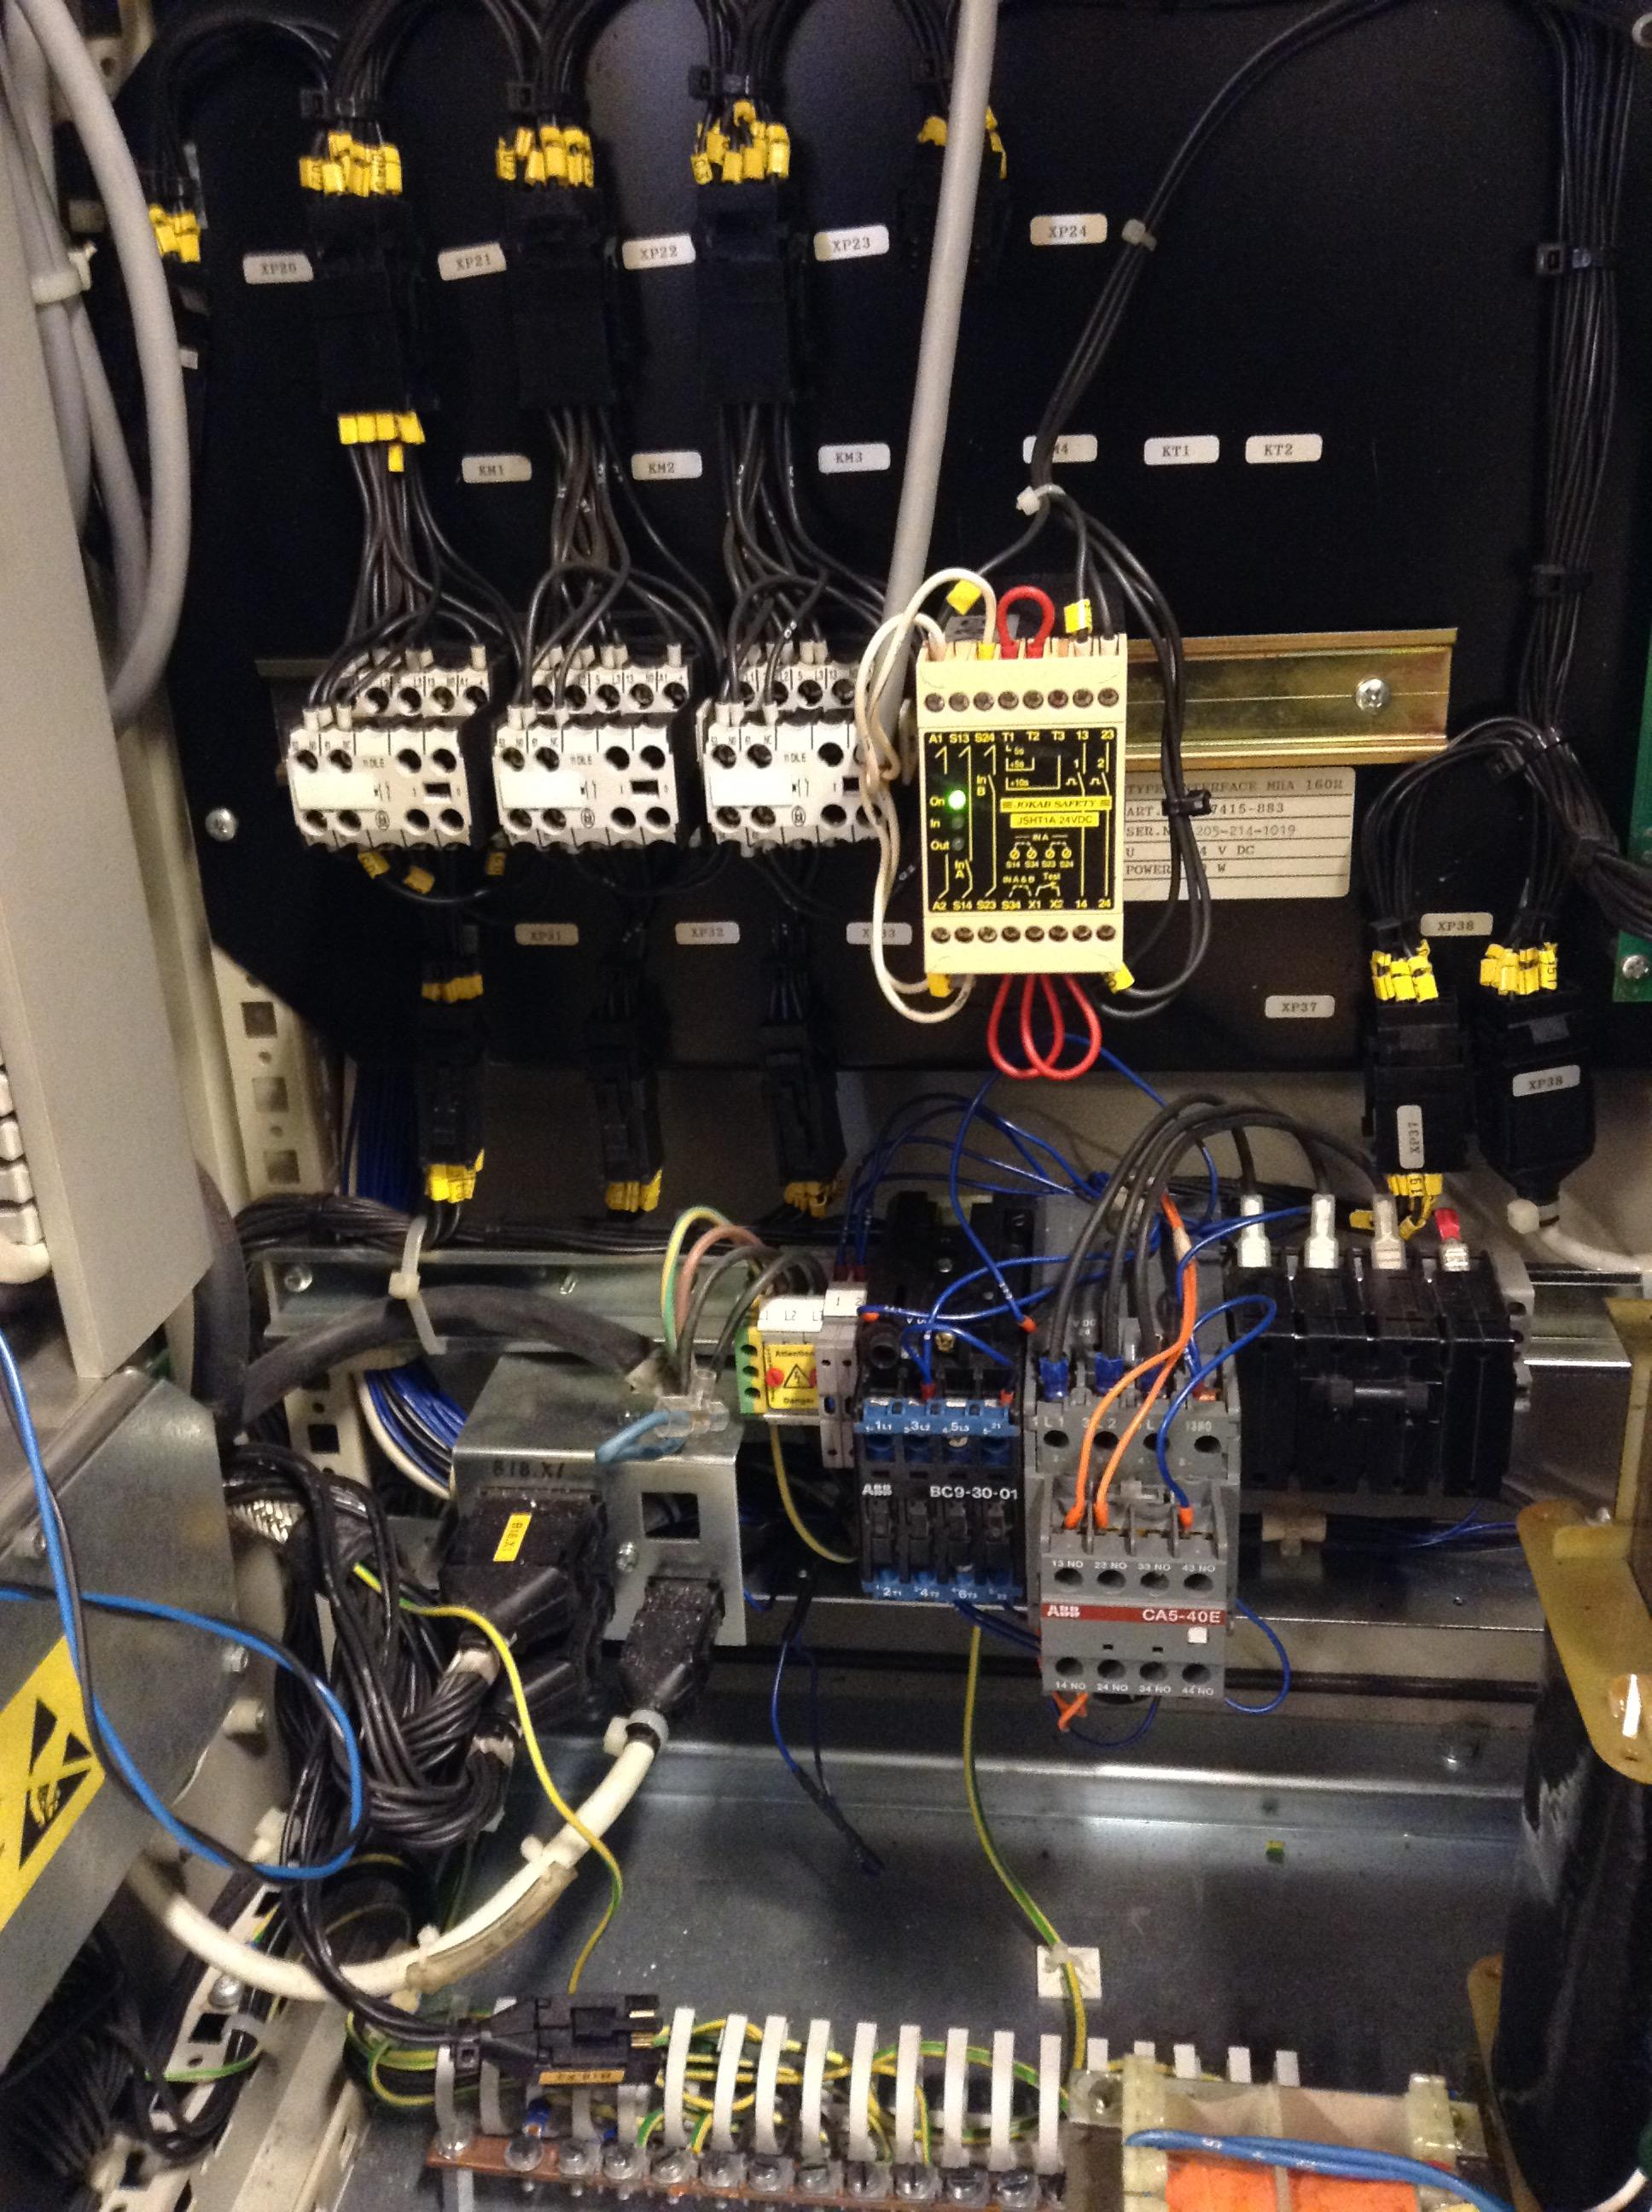 IRB 1500/S3 Program Unite communication Fault — ABB Robotics ... on